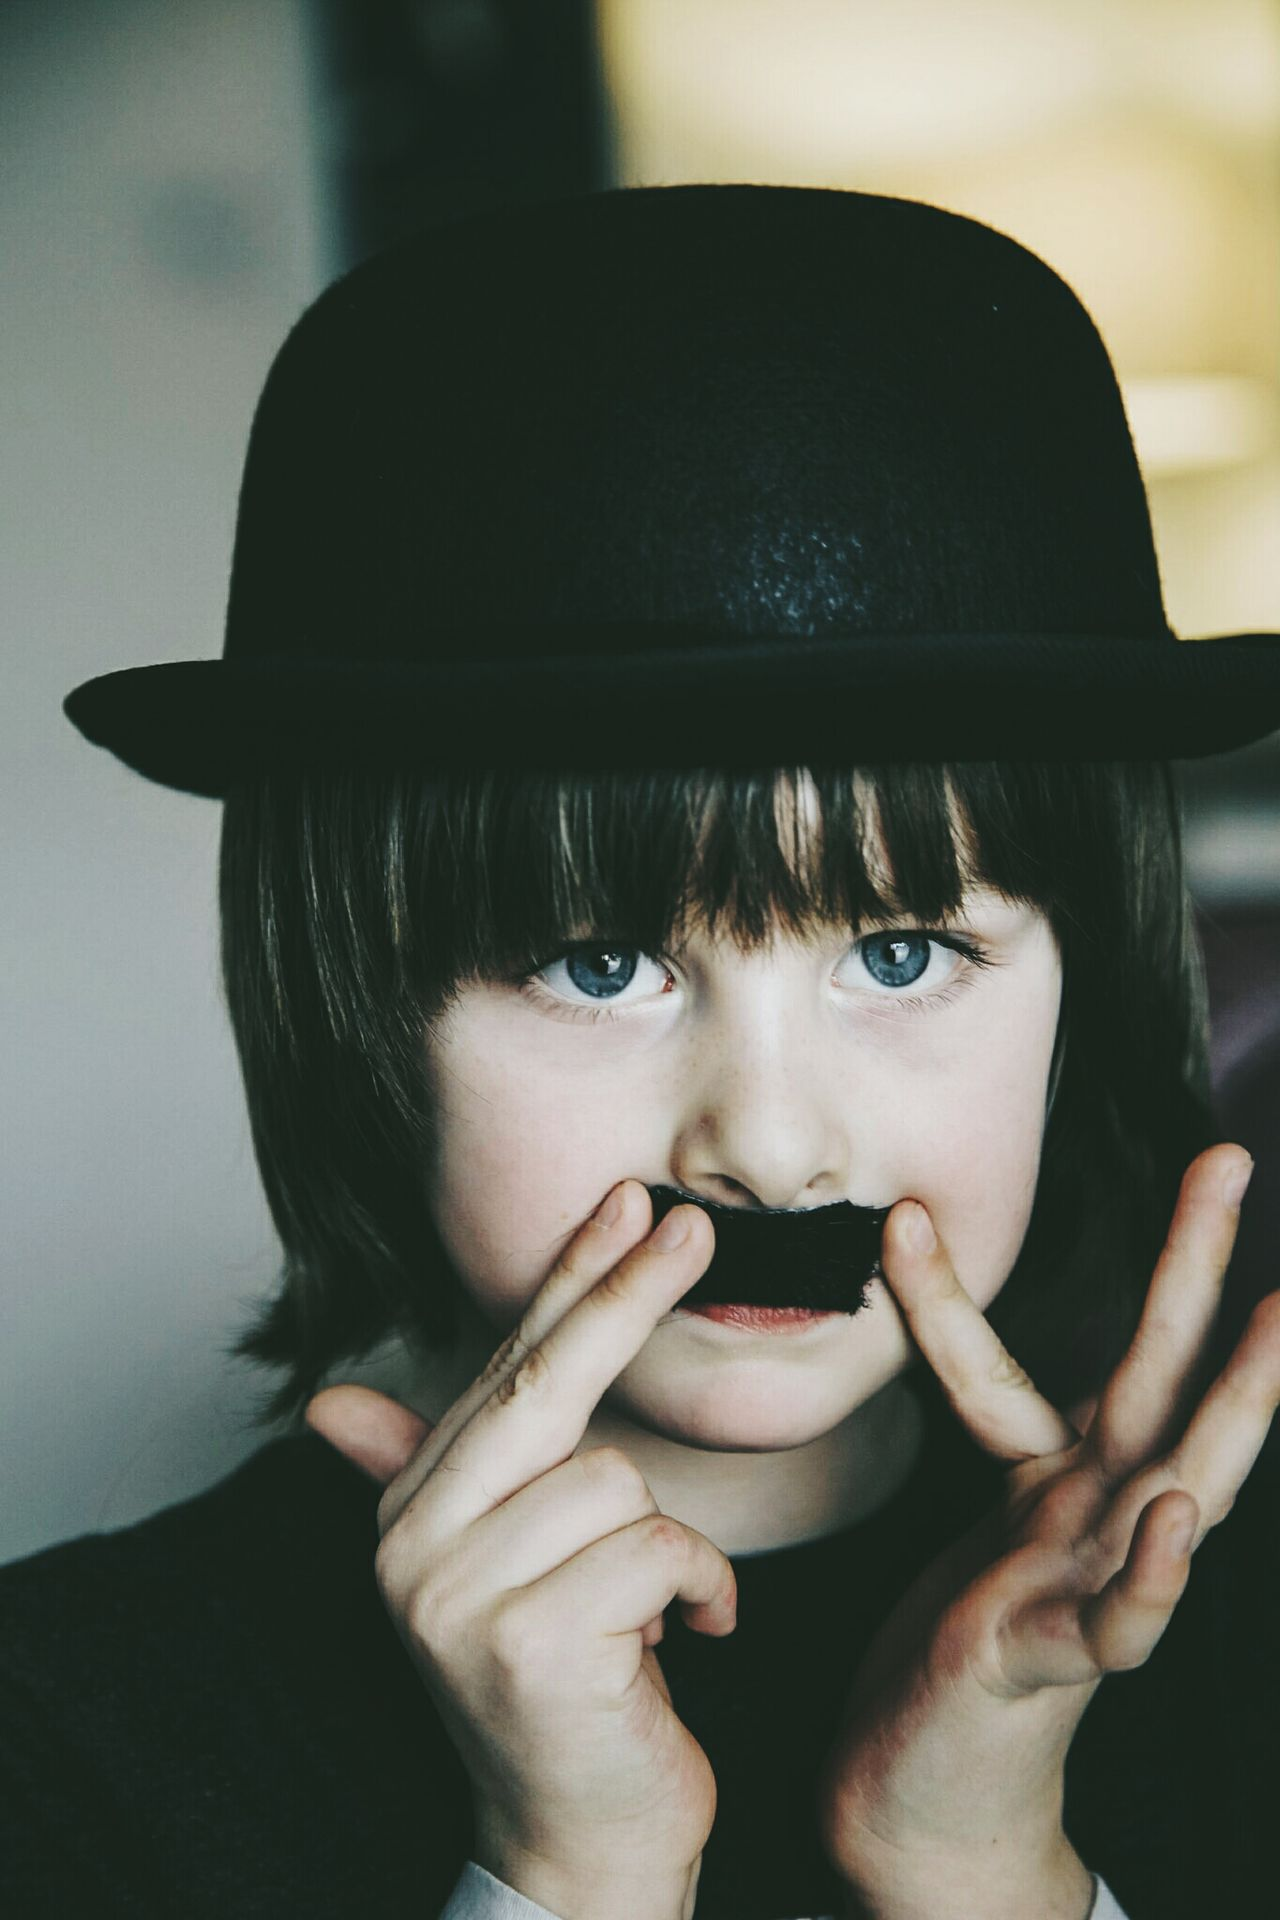 Human Face Headshot Portrait One Person Fun Bowler Hat Charlie Chaplin Lauraloophotography